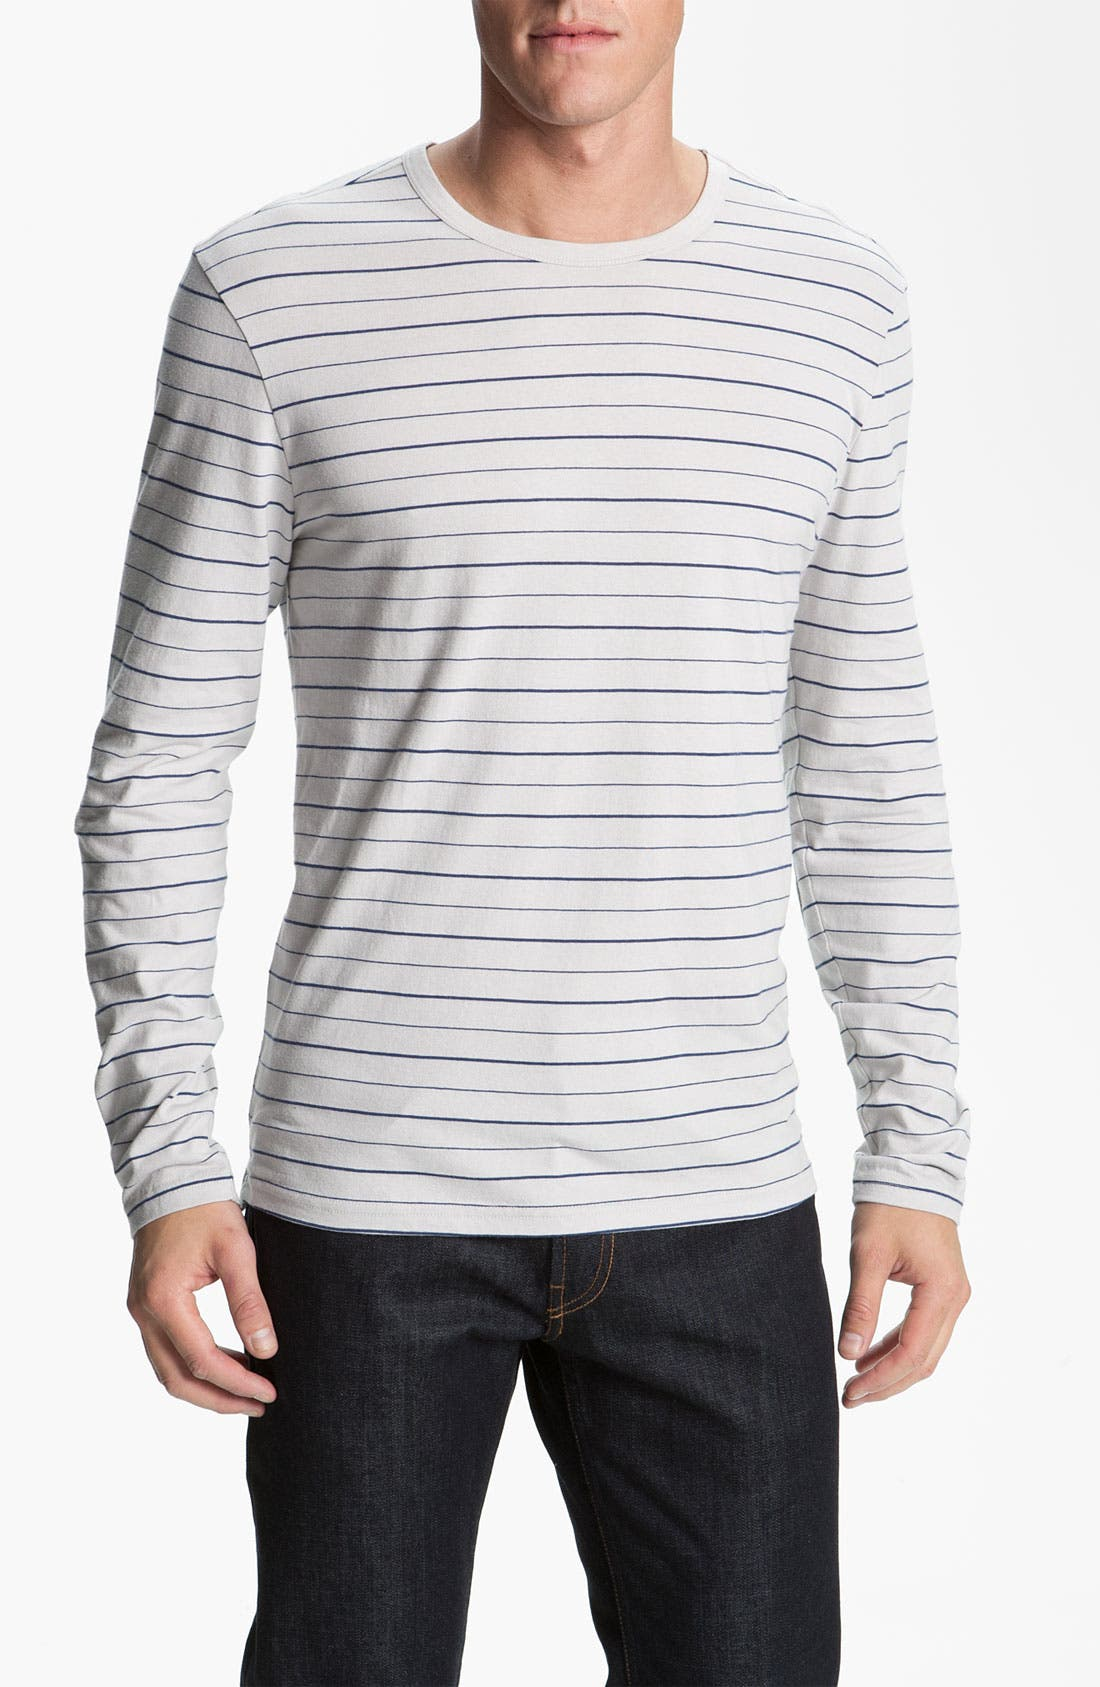 Main Image - 1901 Stripe Long Sleeve T-Shirt